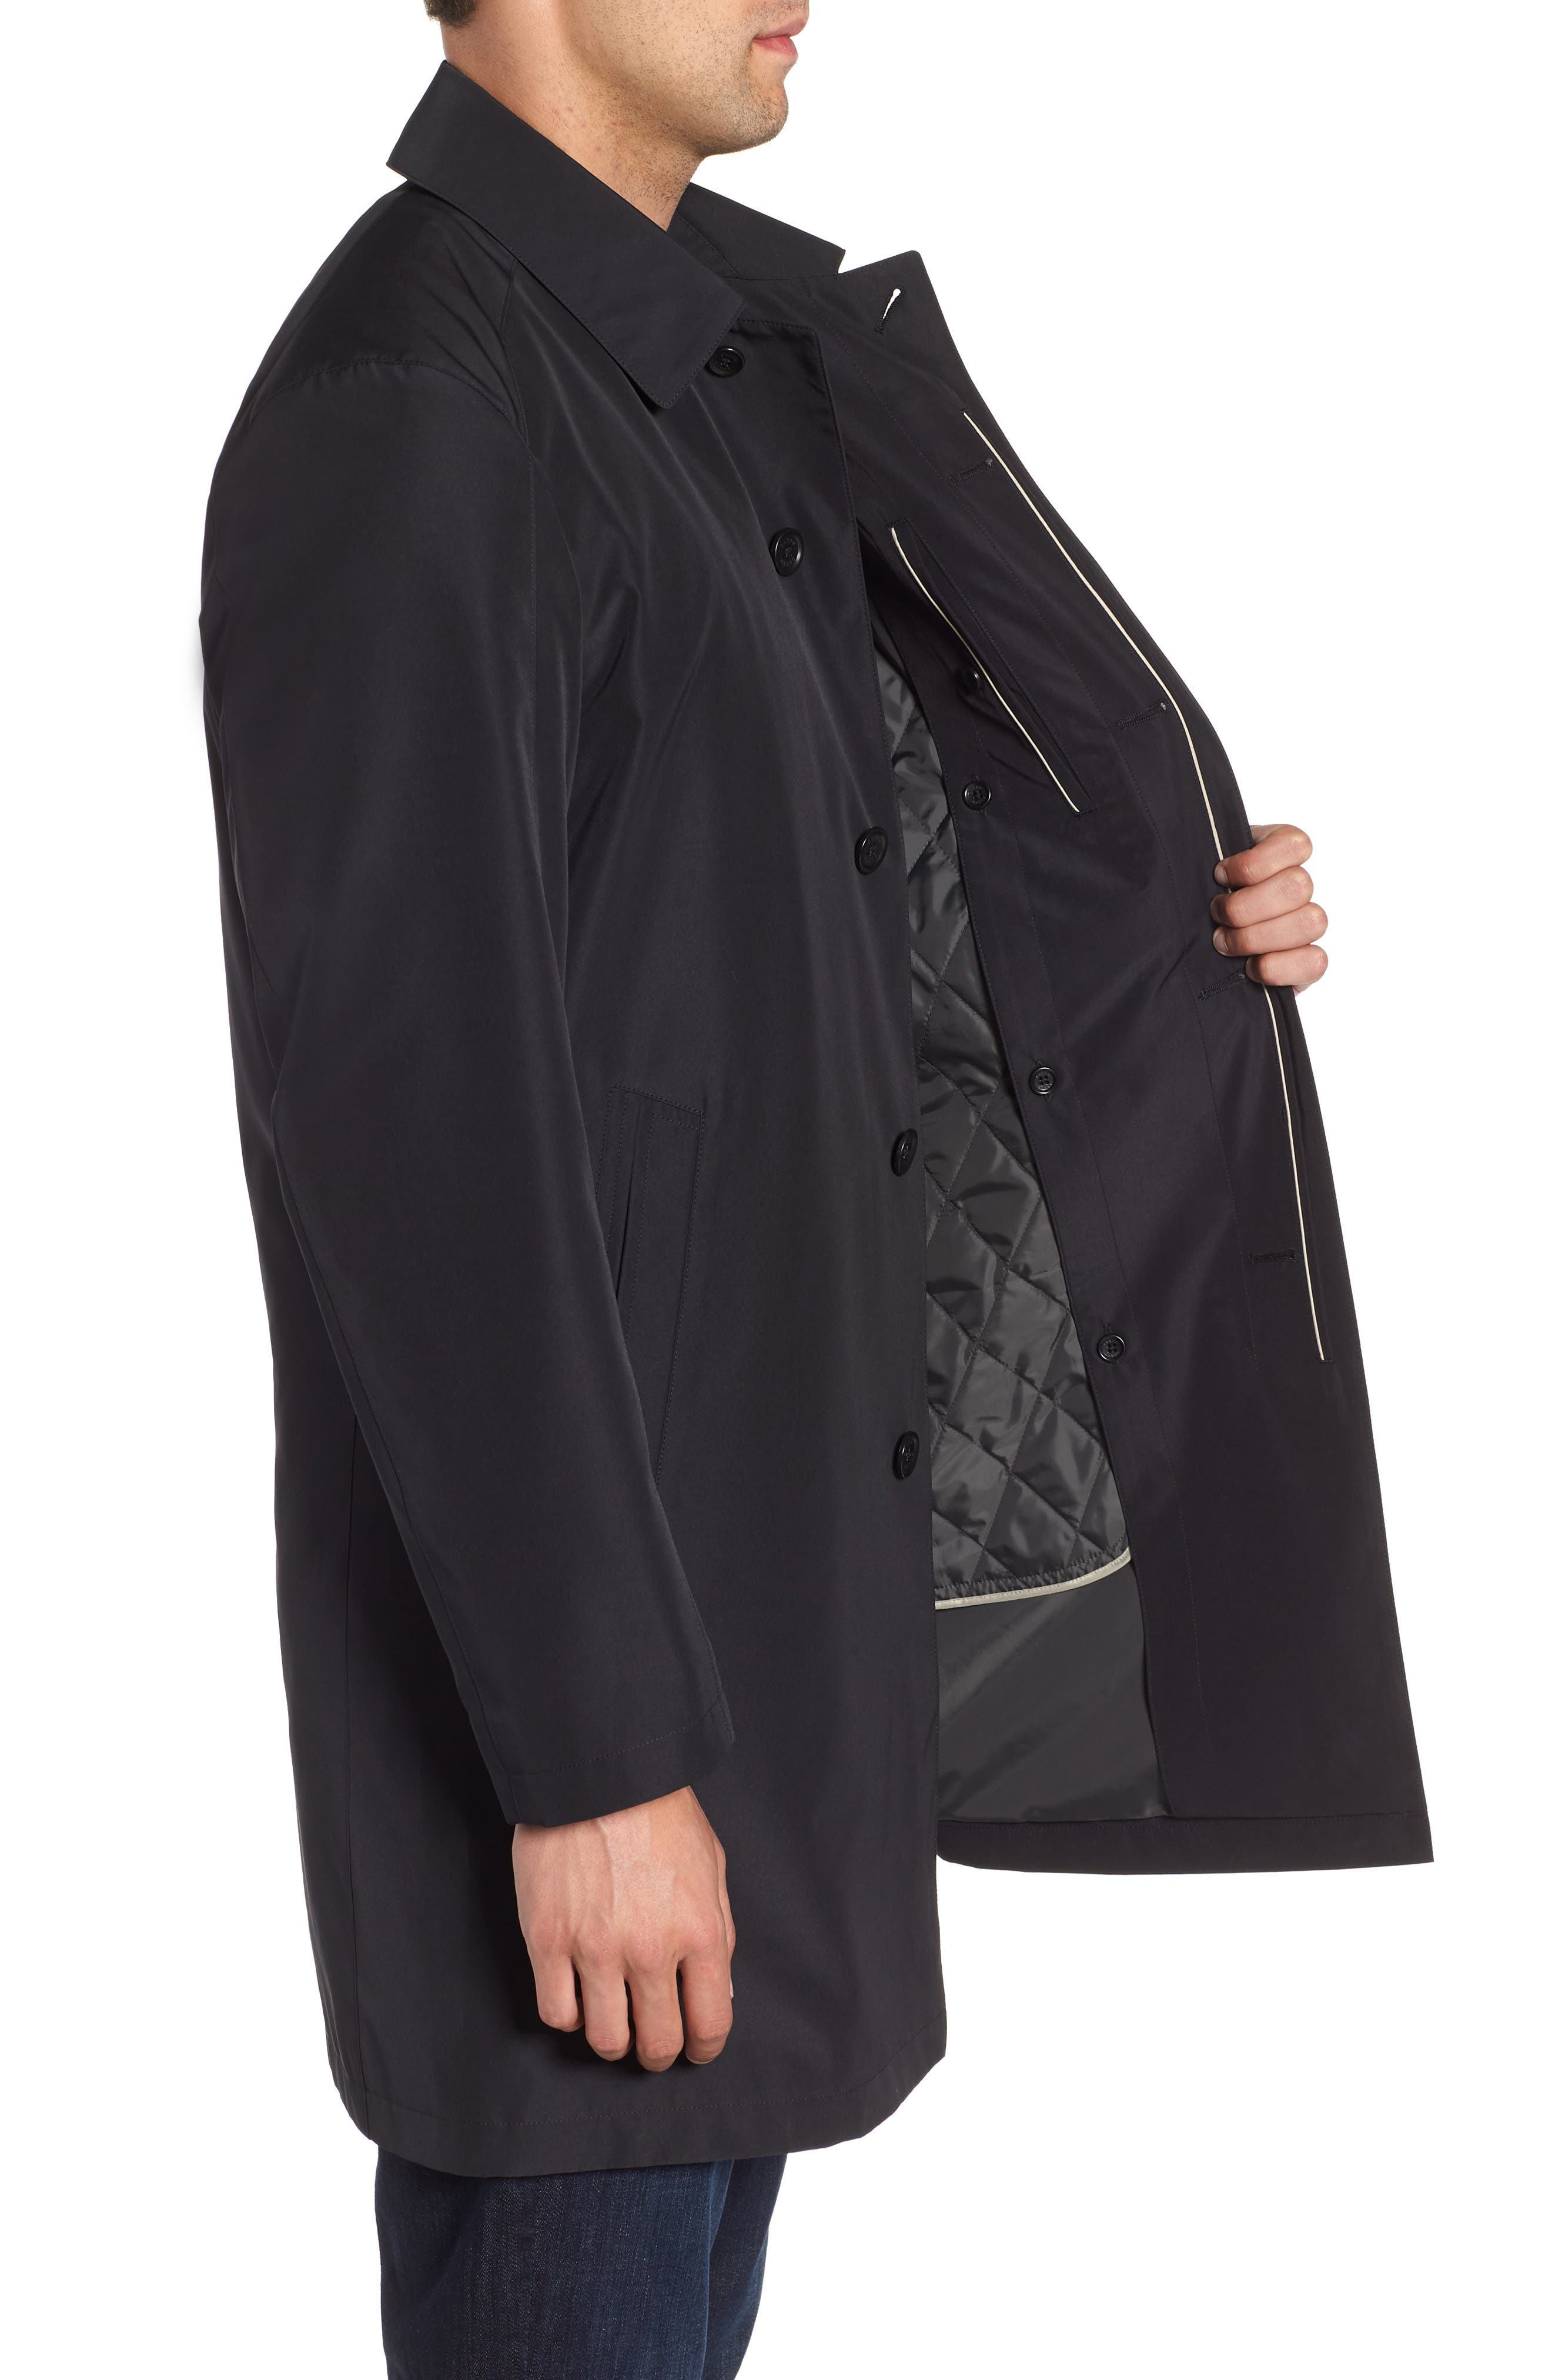 Ducasse Raincoat,                             Alternate thumbnail 3, color,                             BLACK